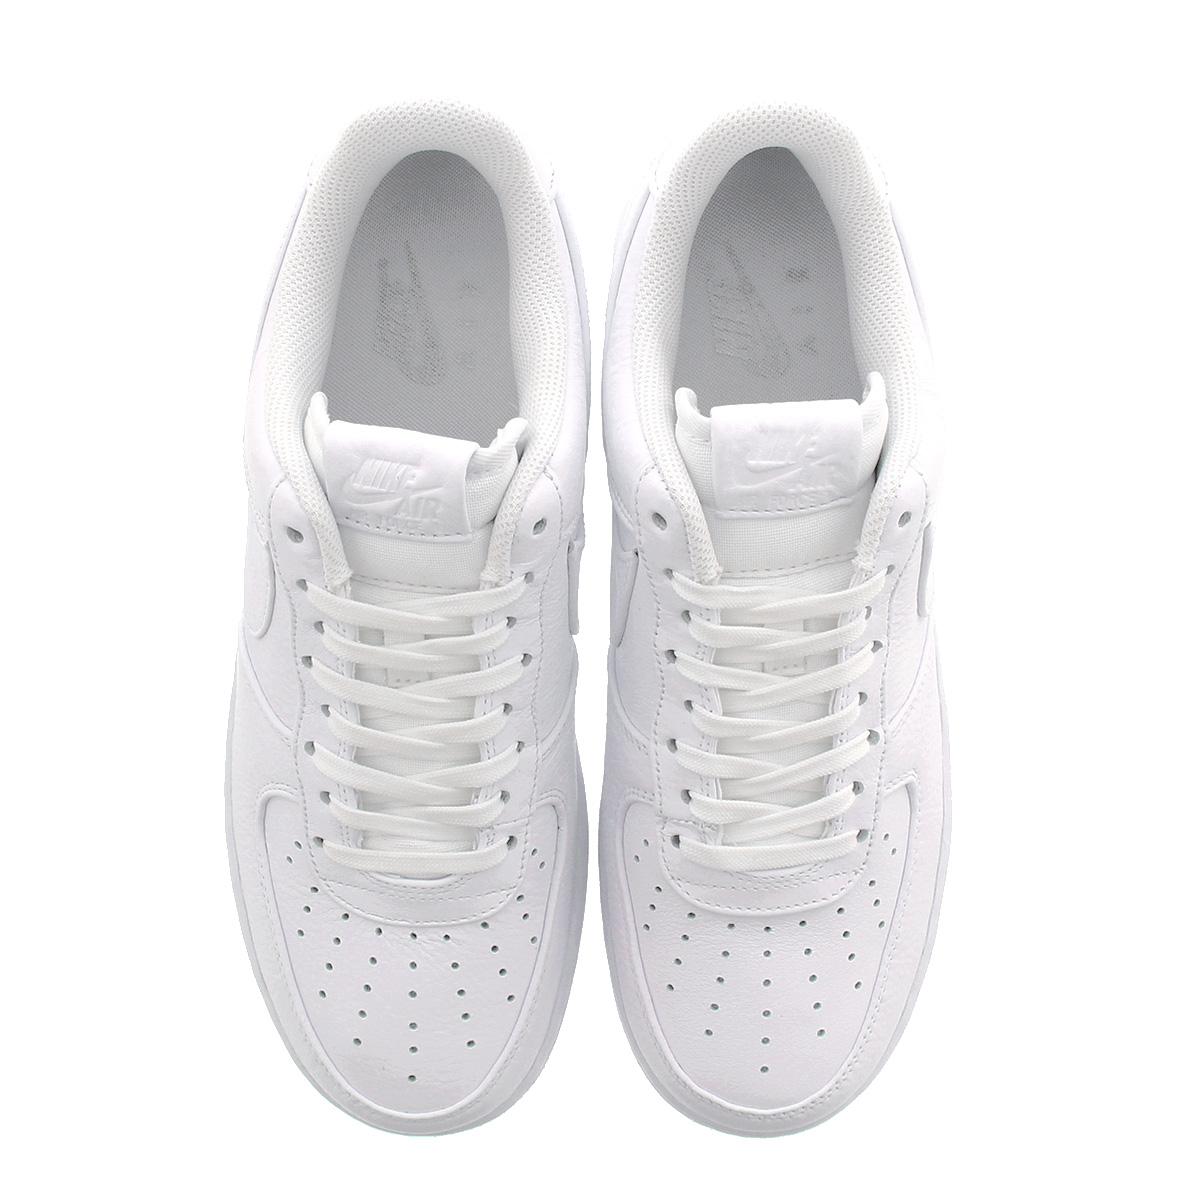 2 WHITEWHITEWHITE at4143 103 premium in NIKE AIR FORCE 1 '07 in PREMIUM 2 Nike air force 1 '07